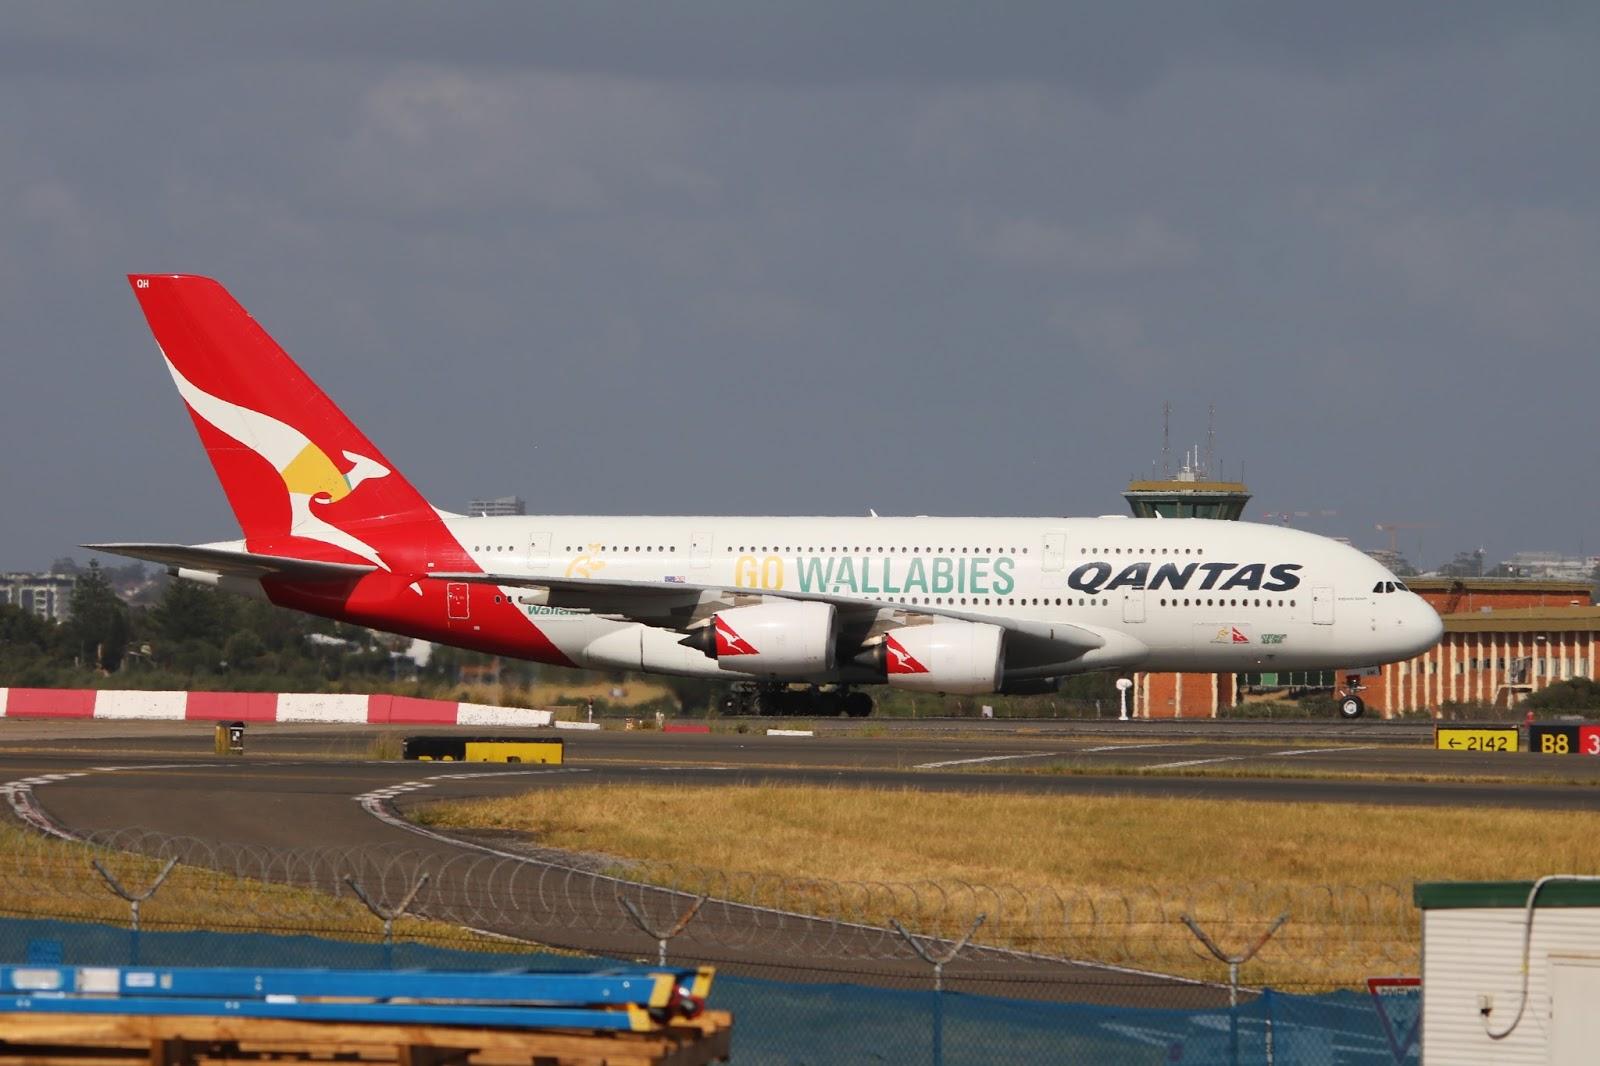 qantas jakarta sydney - photo#19